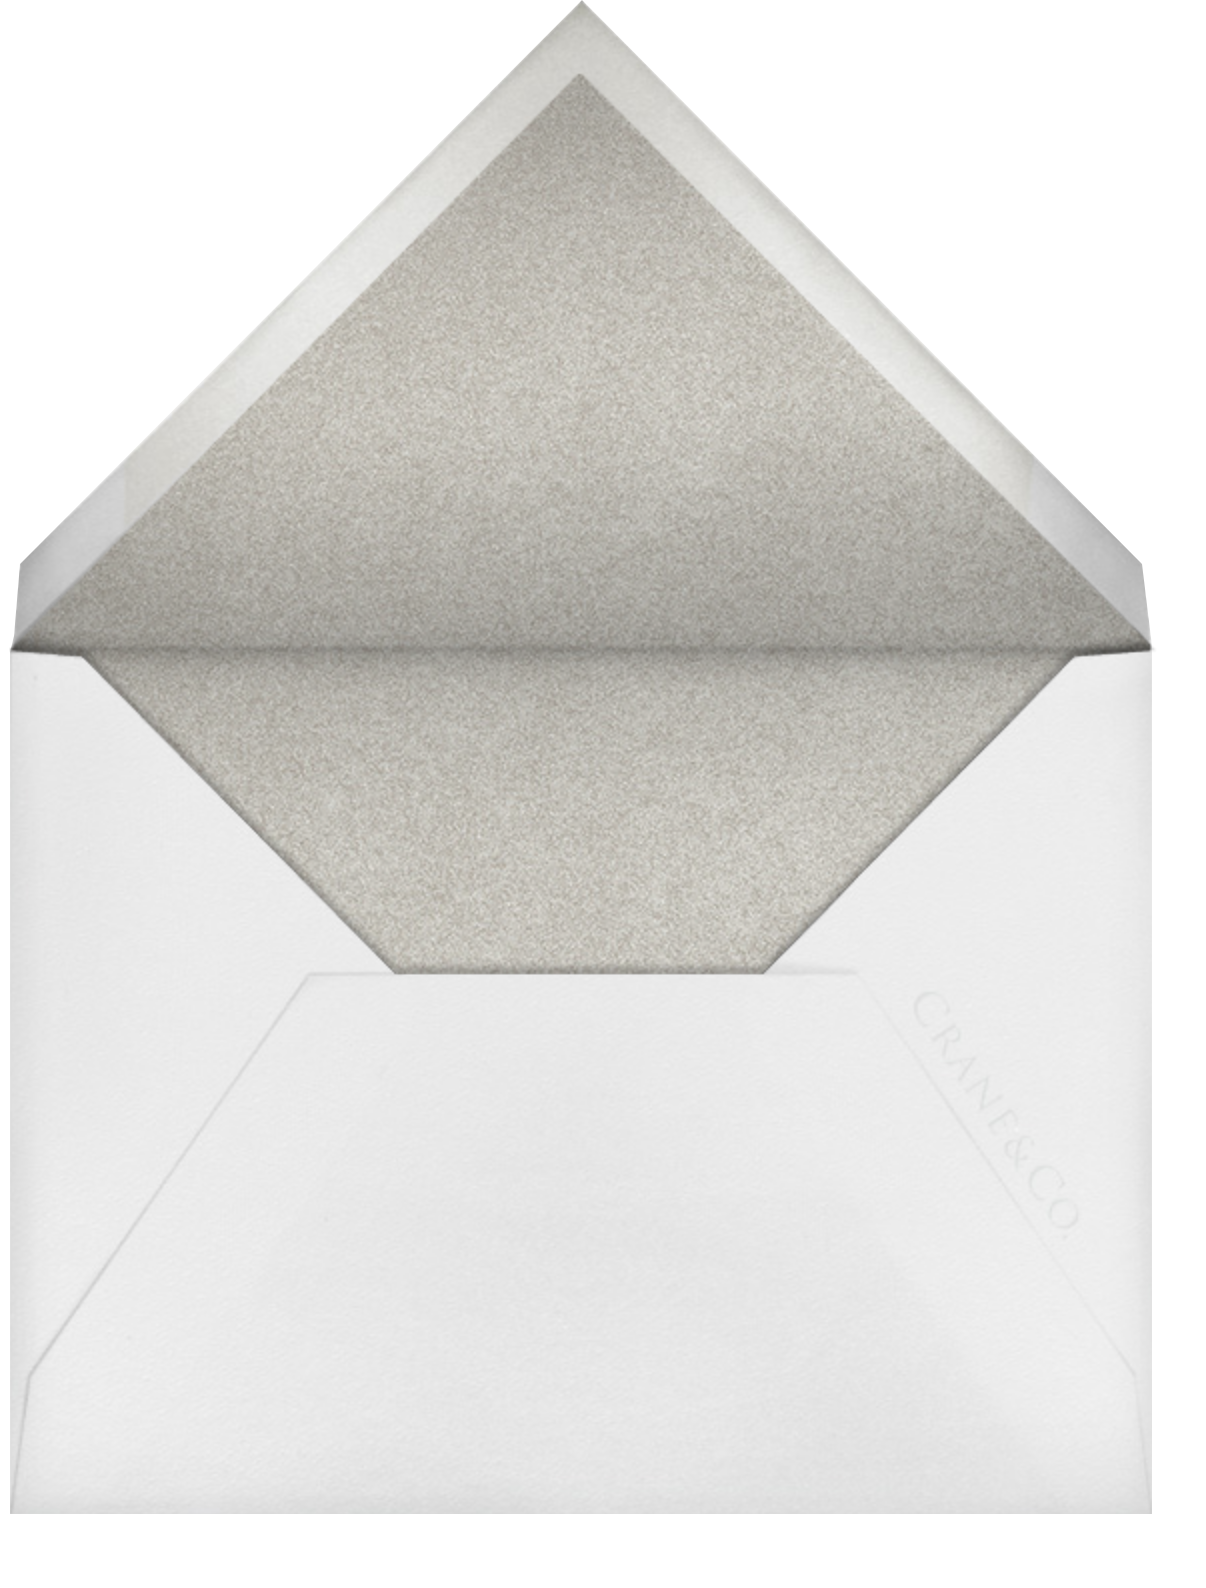 Bobbin I (Engagement) - Platinum - Paperless Post - null - envelope back